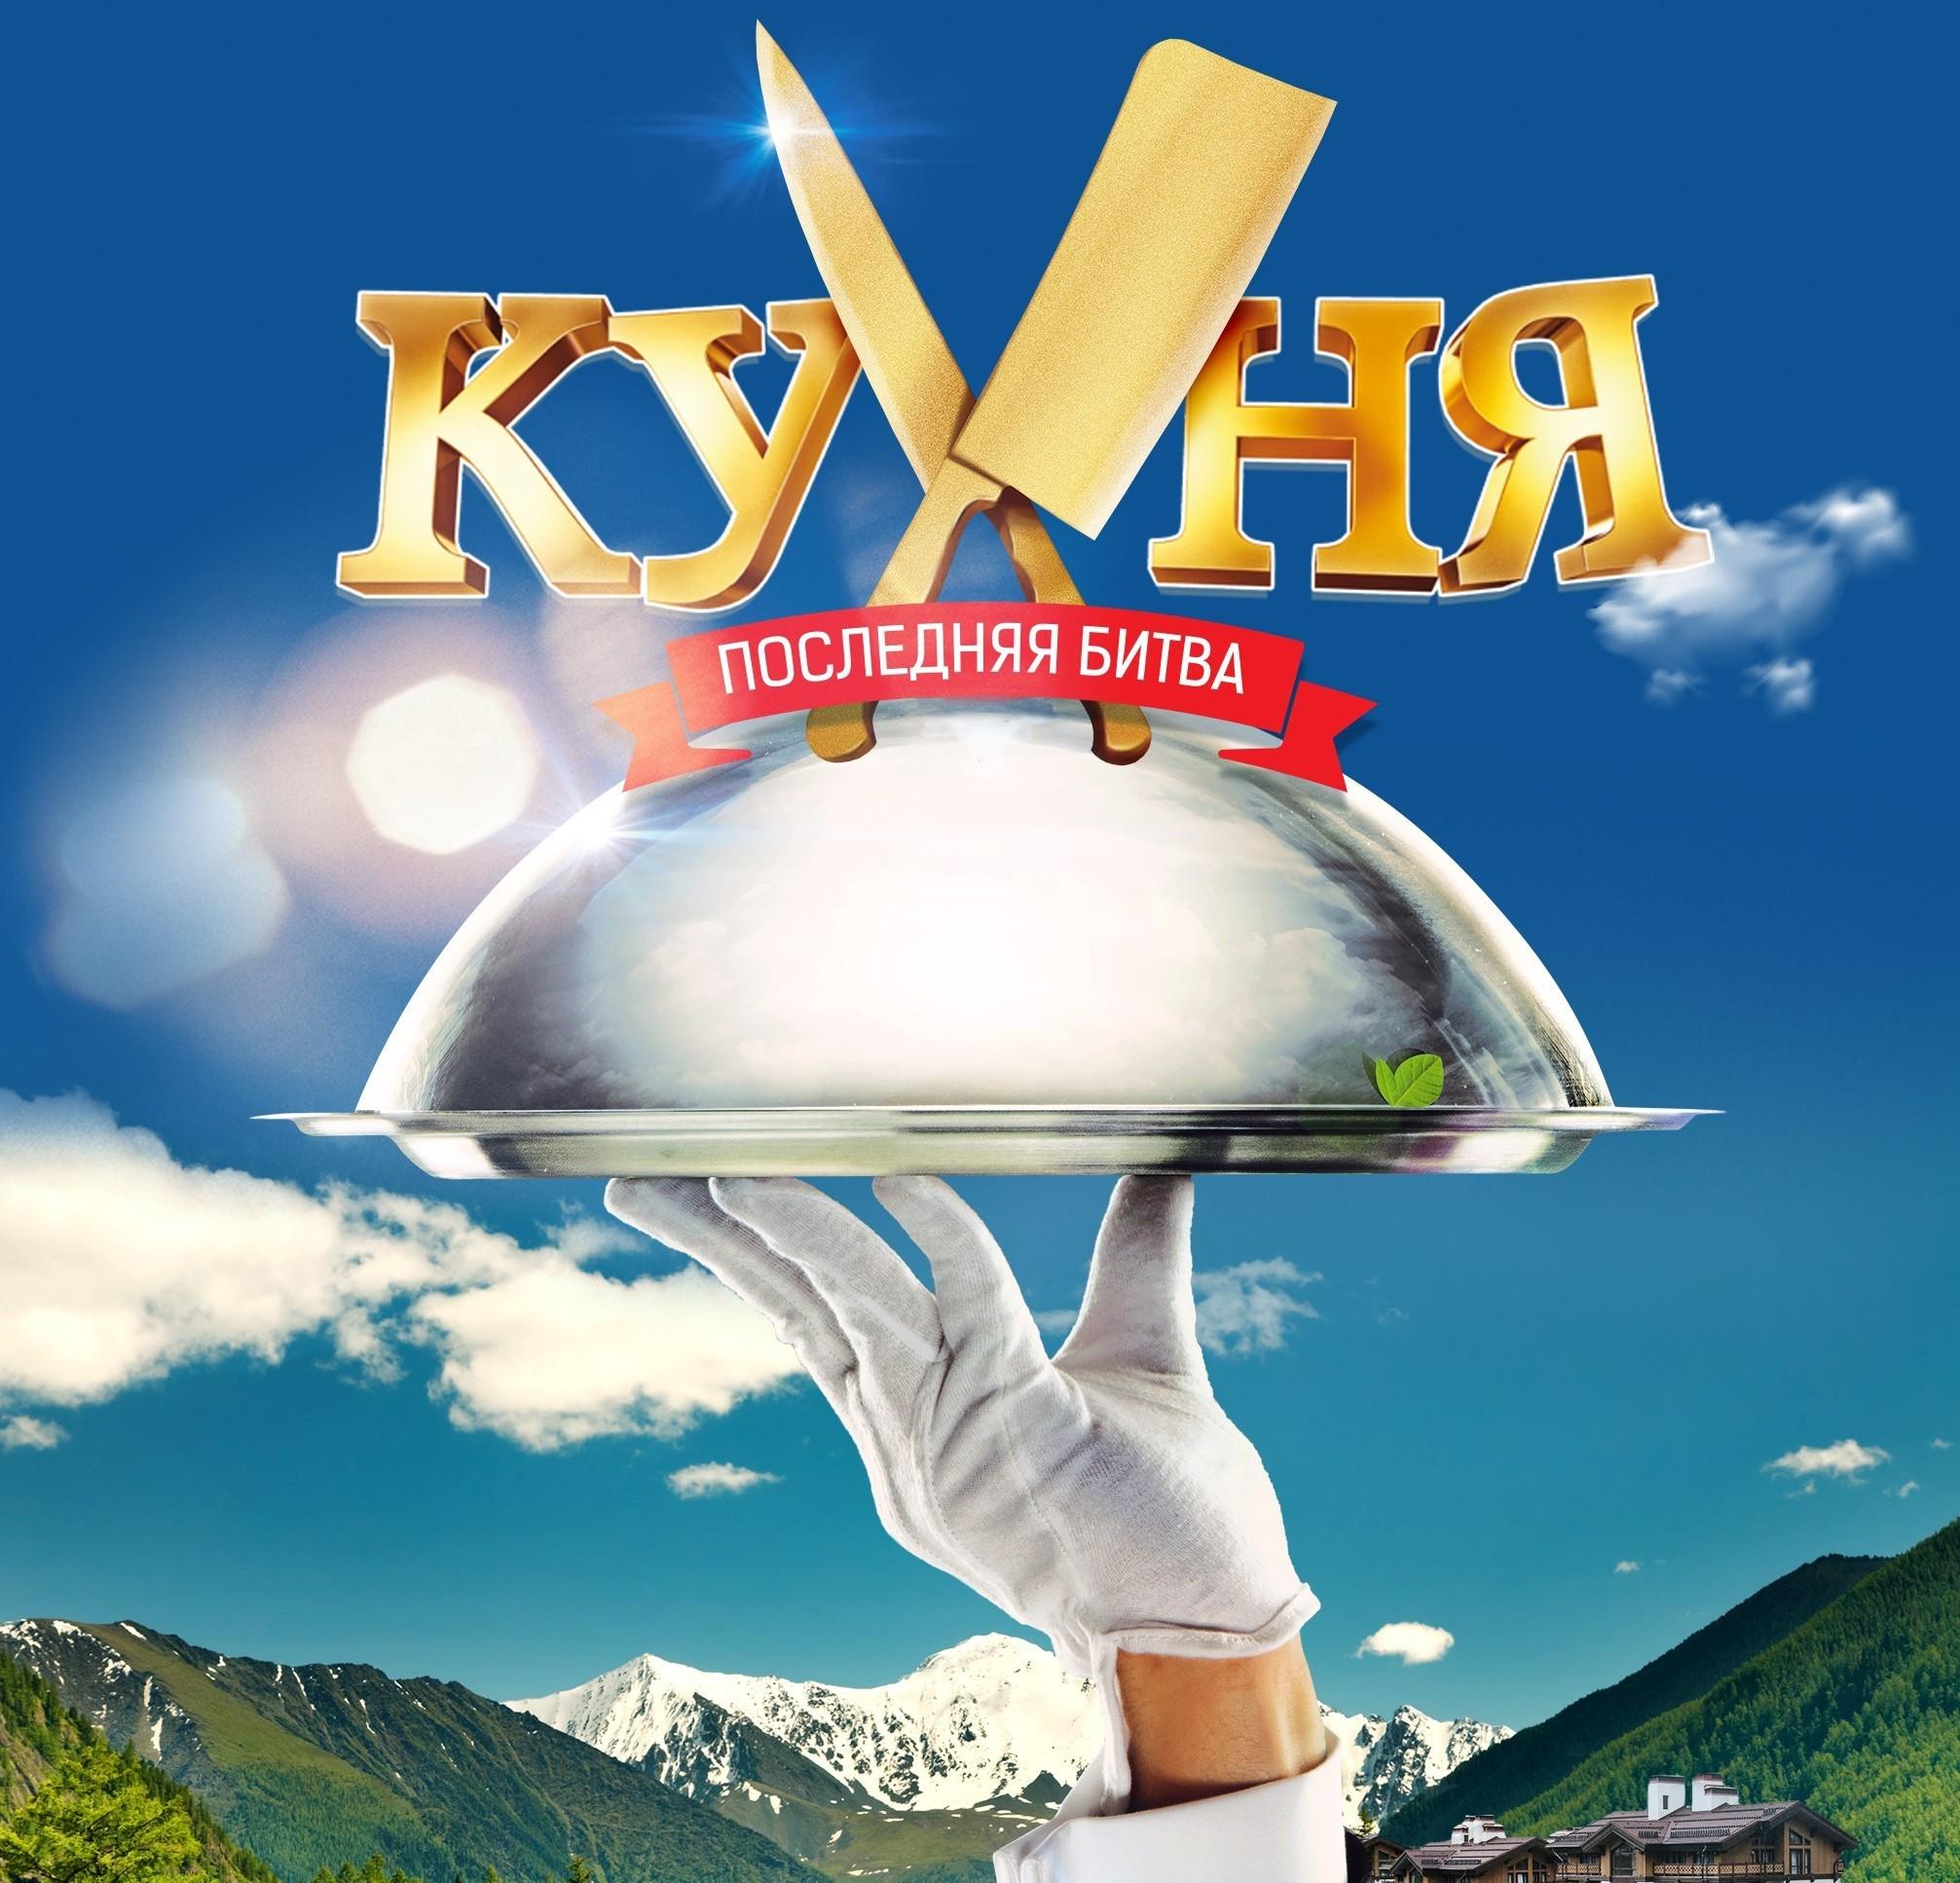 kuxnyaposlednyayabitva_220437